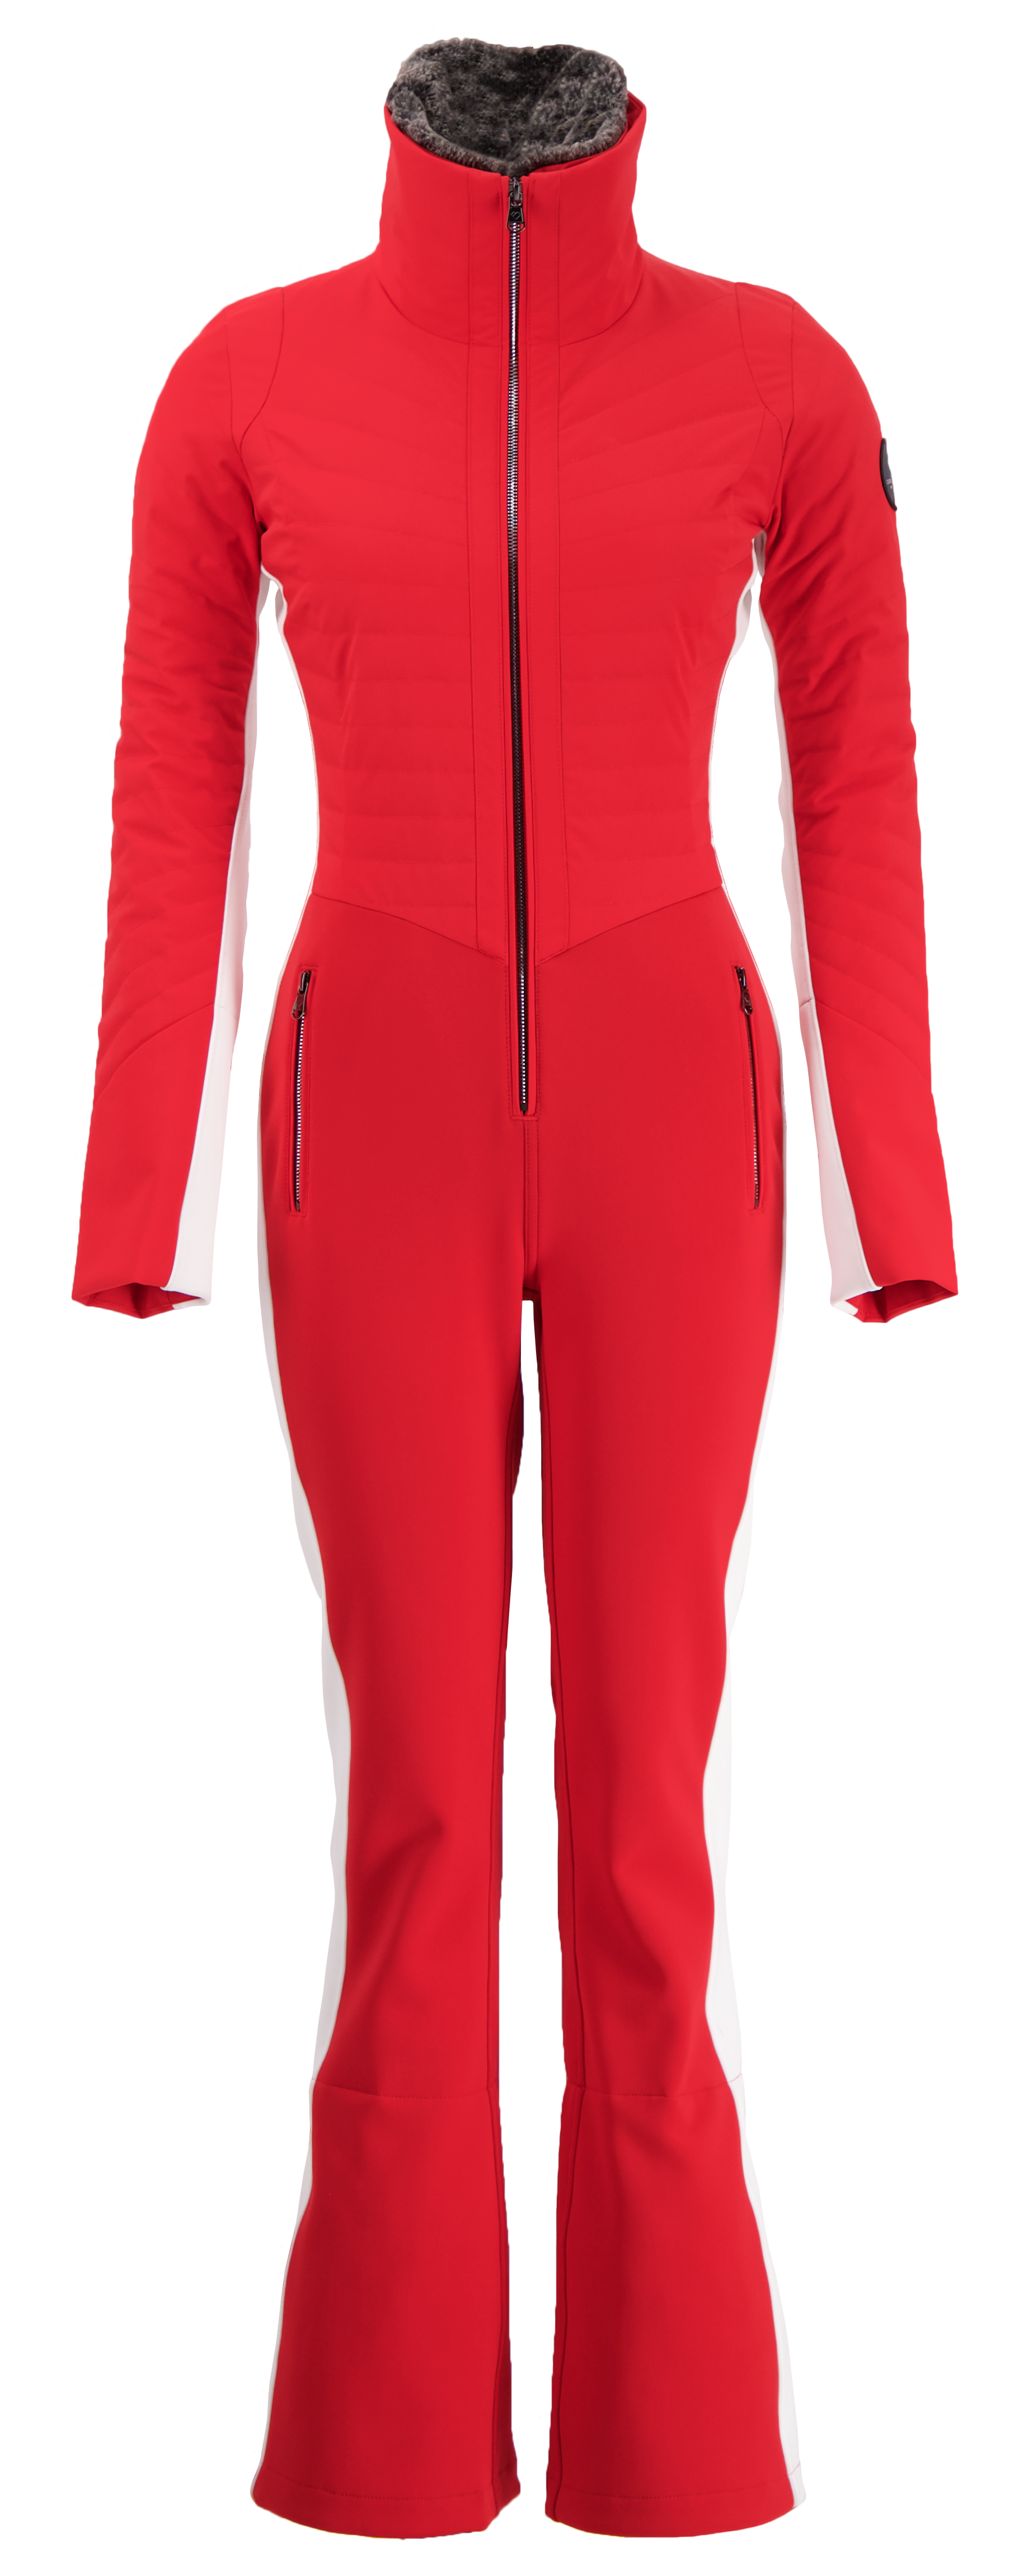 Lindsey Vonn Racing